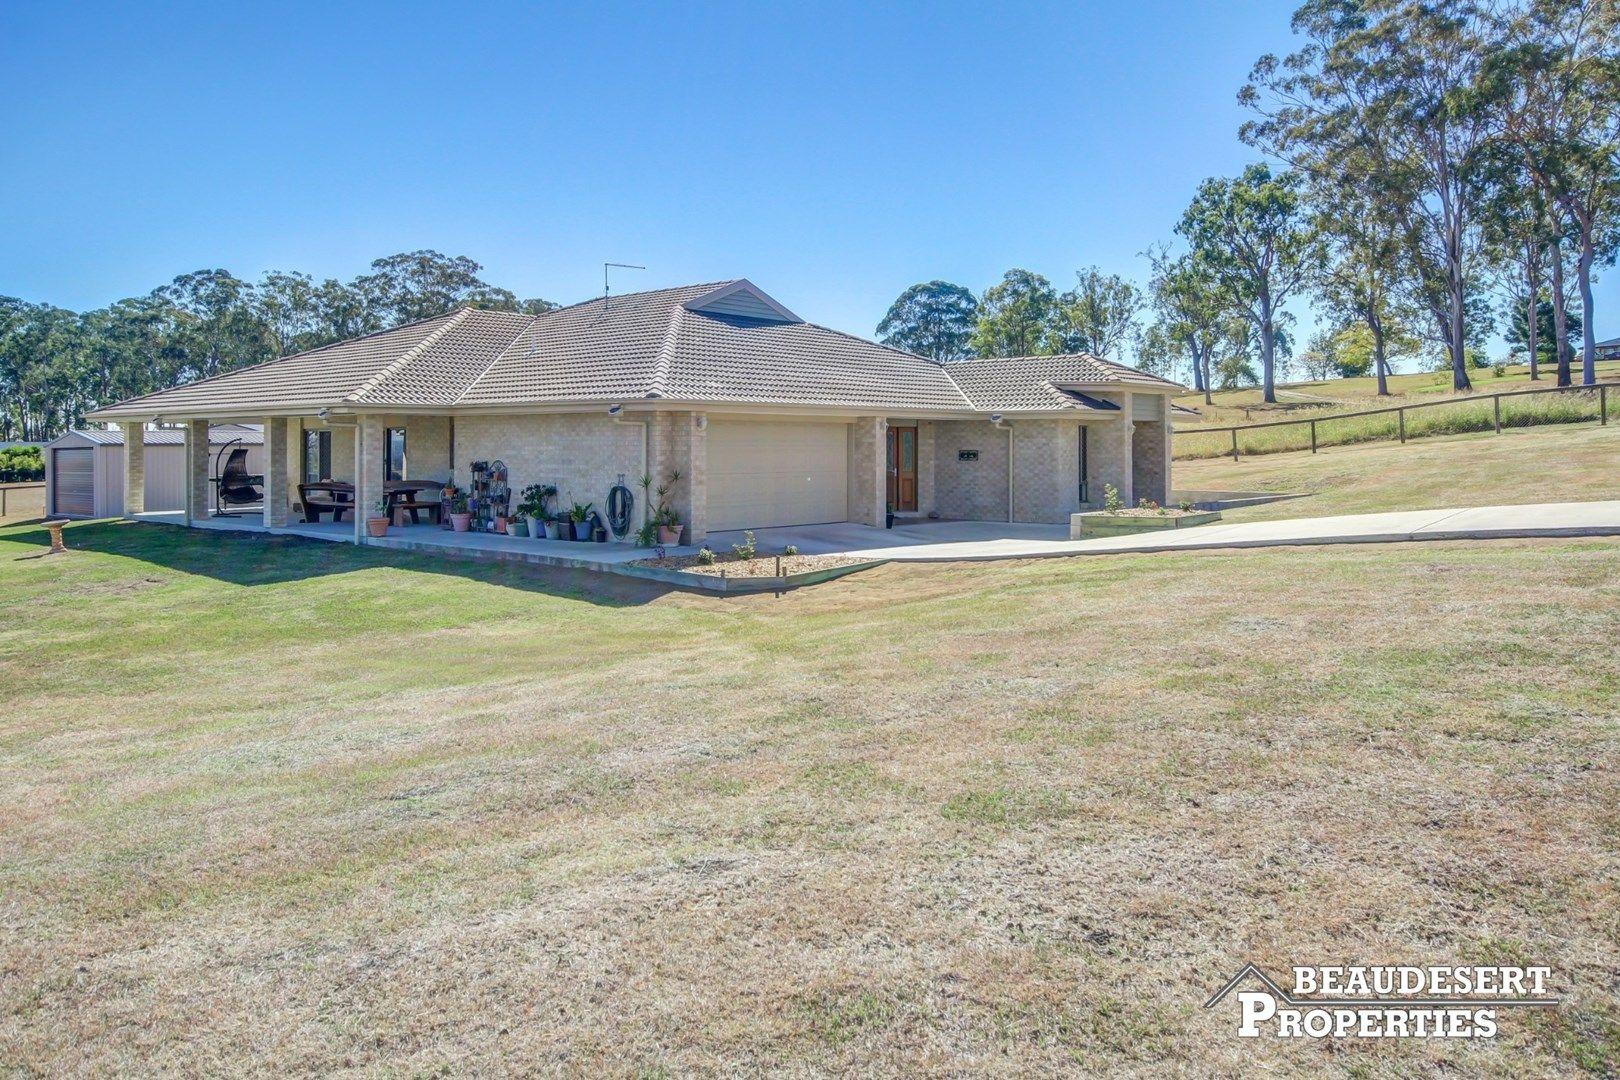 70-74 Panorama Drive, Beaudesert QLD 4285, Image 0